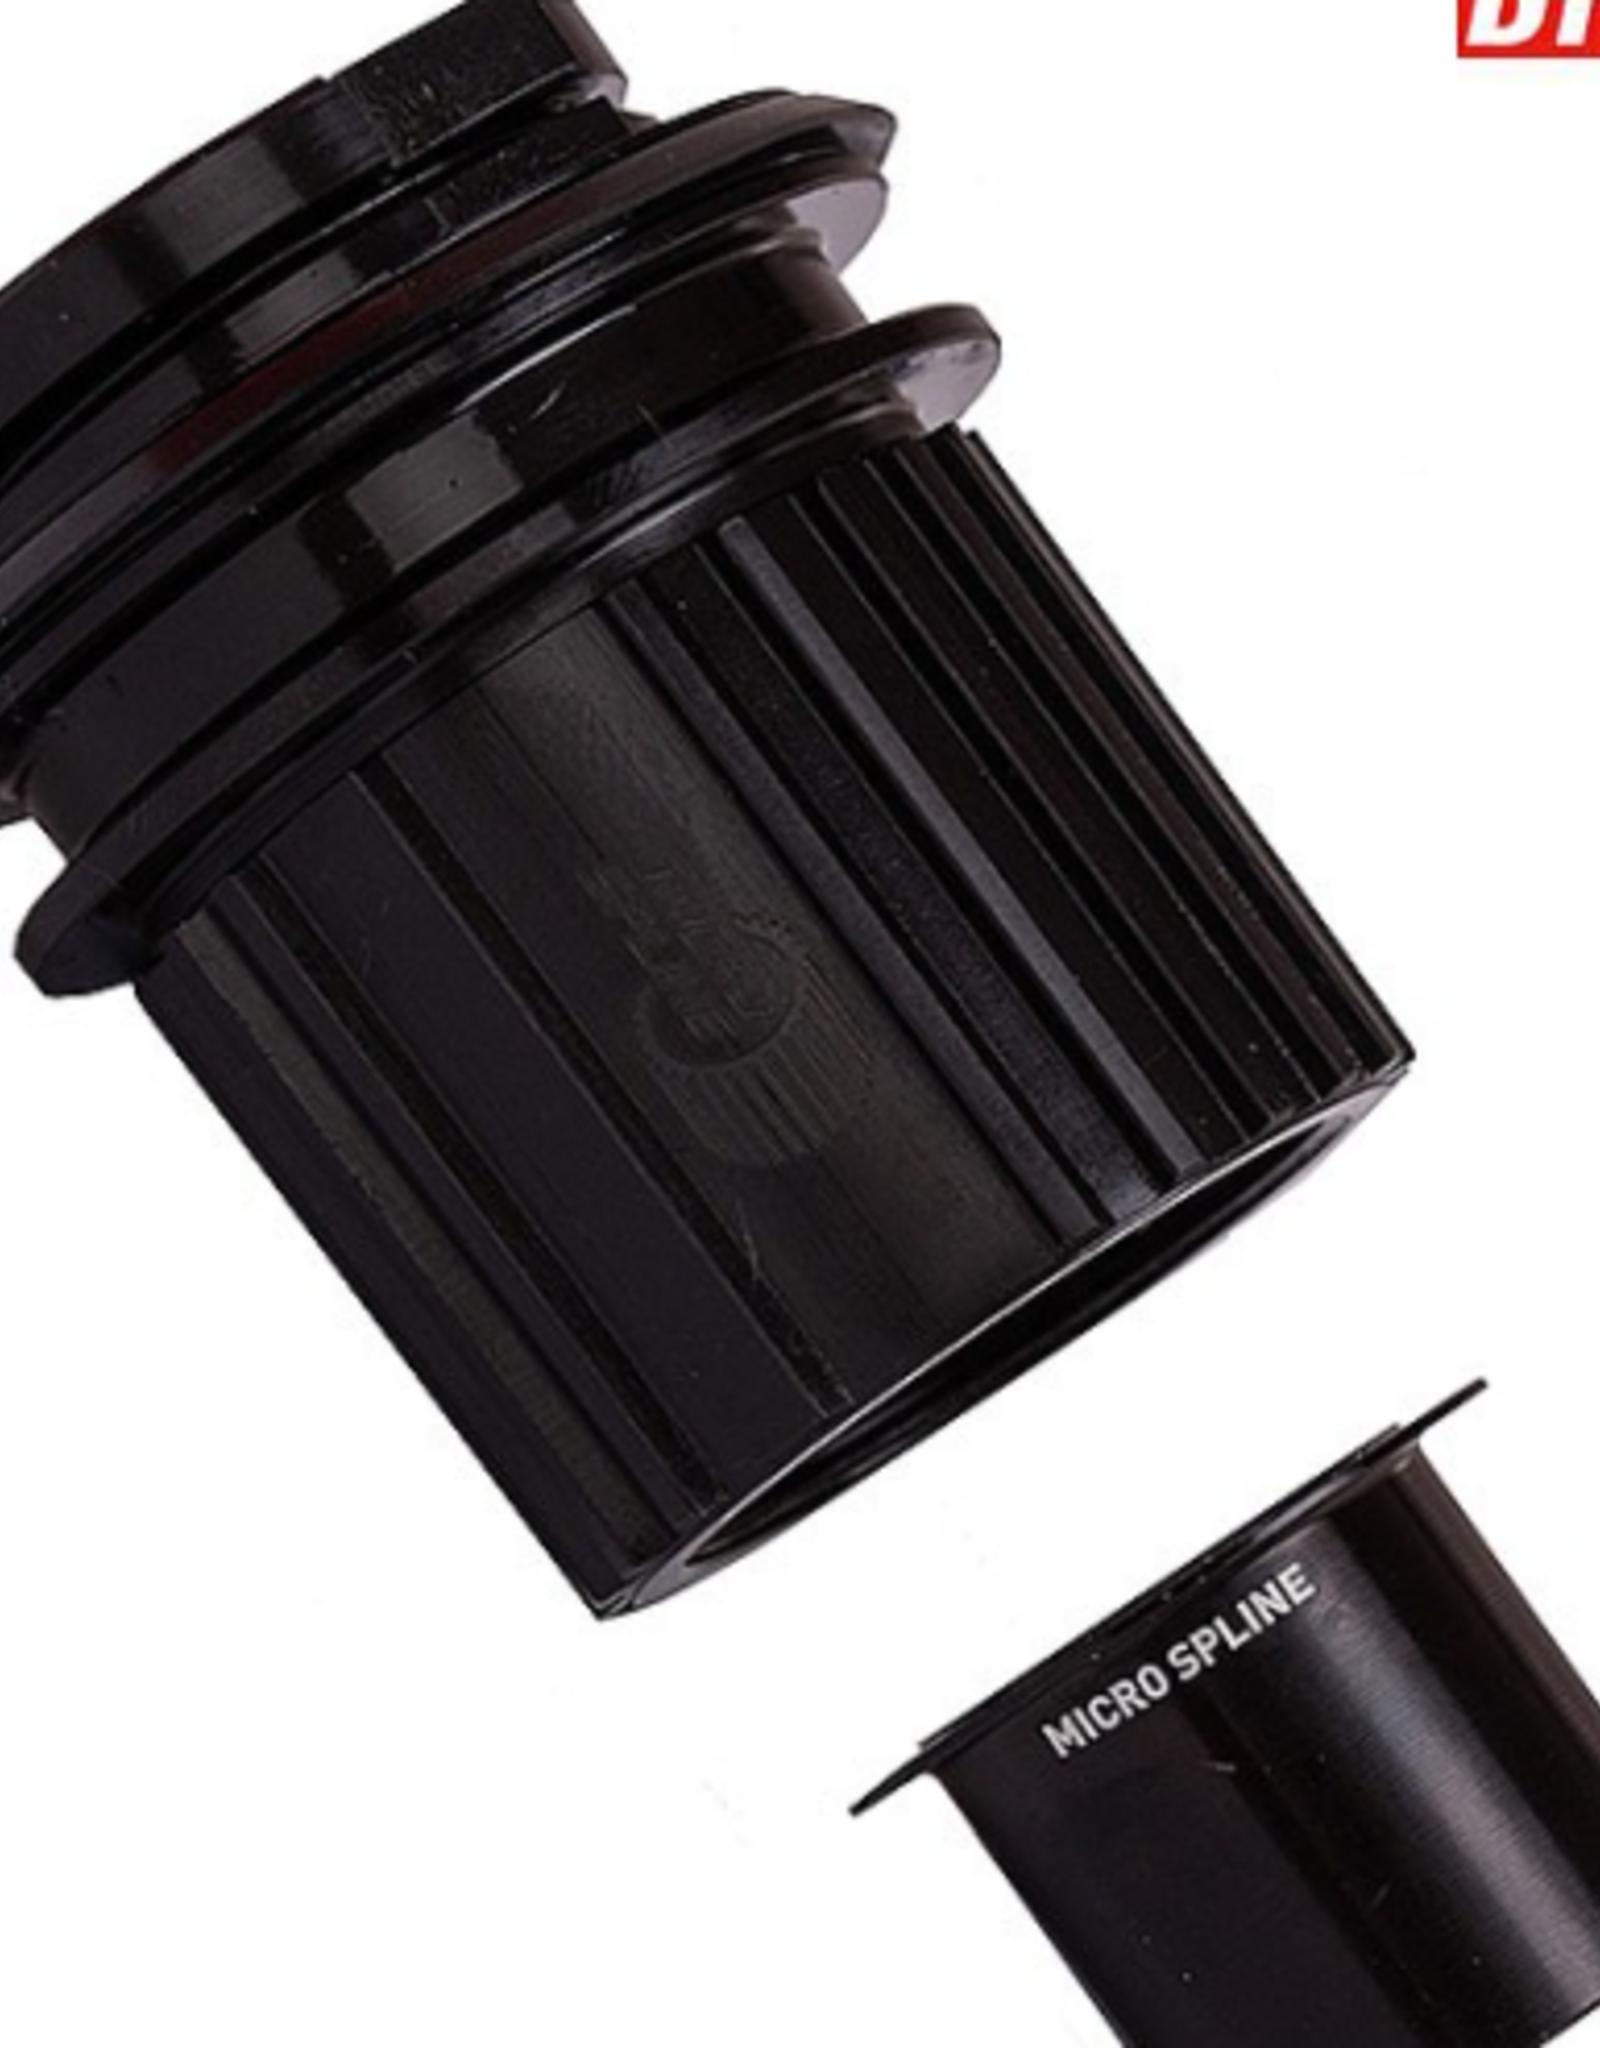 DT Swiss DT Swiss Conversion Kit Shimano 12-speed Micro Spline 3-Pawl® System Freehub Body